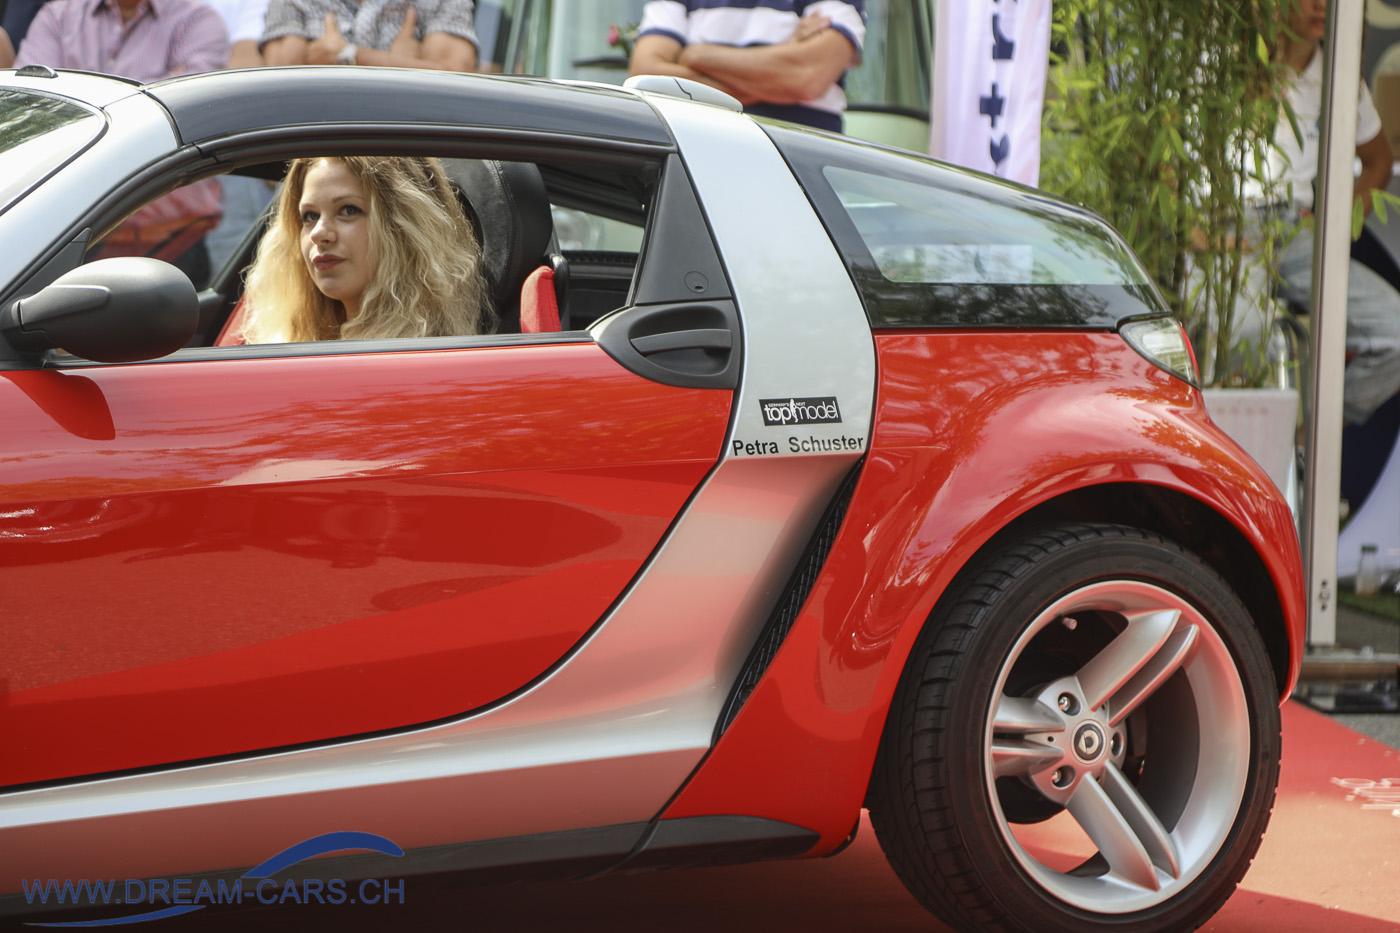 ZCCA - Zurich Classic Car Award, Bürkliplatz Zürich, 19. August 2020. Der Smart Brabus Roadster mit Petra Schuster am Lenkrad